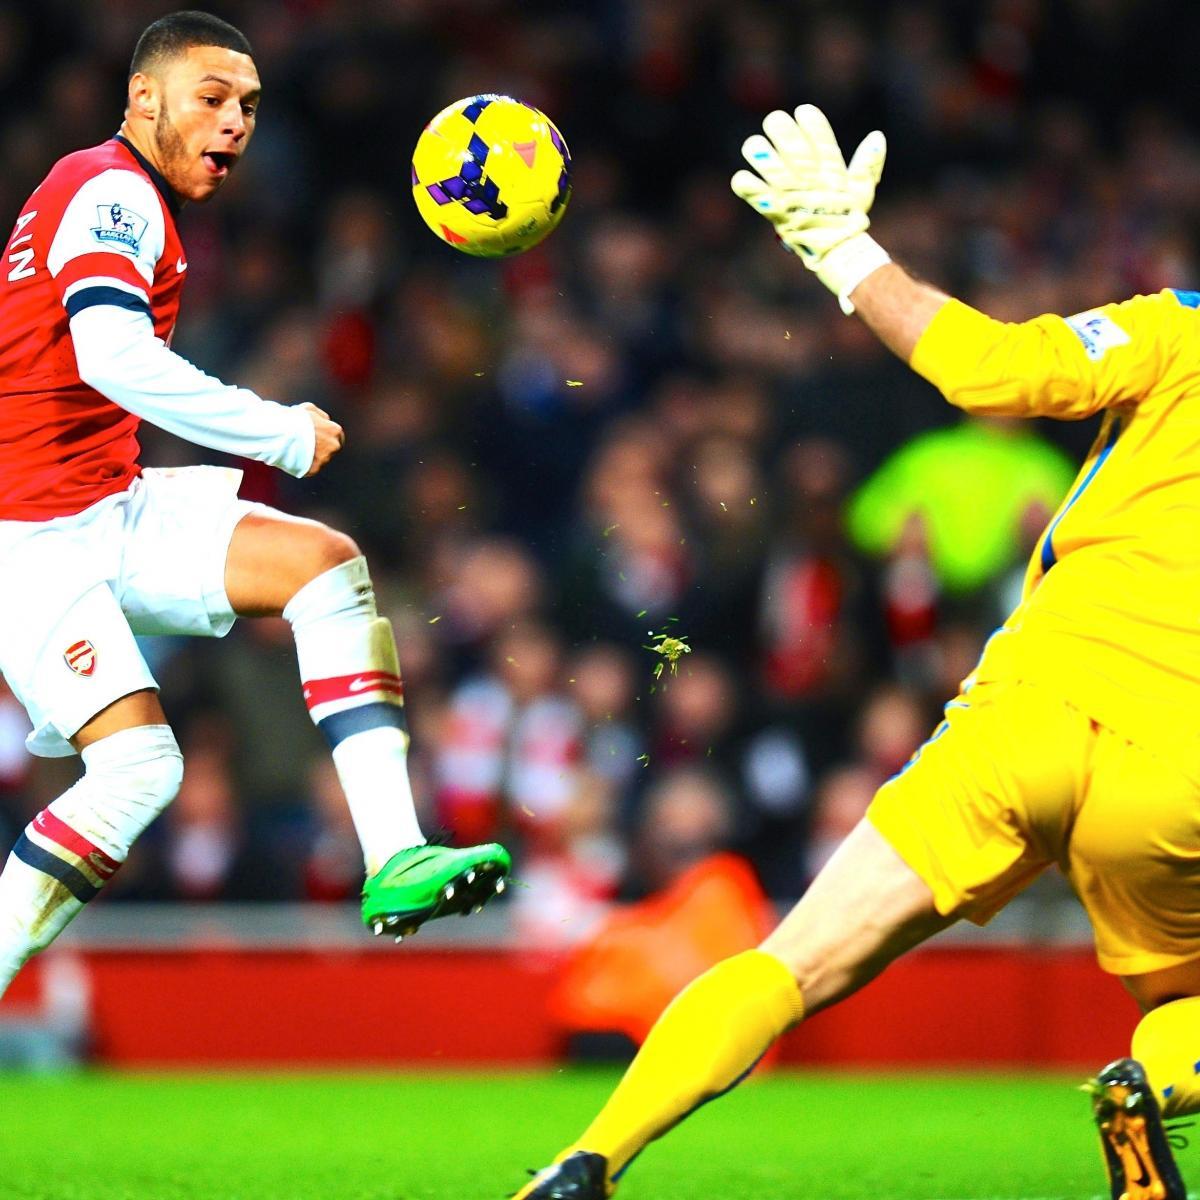 Arsenal Vs Barcelona Live Score Highlights From: Arsenal Vs. Crystal Palace: Premier League Live Score